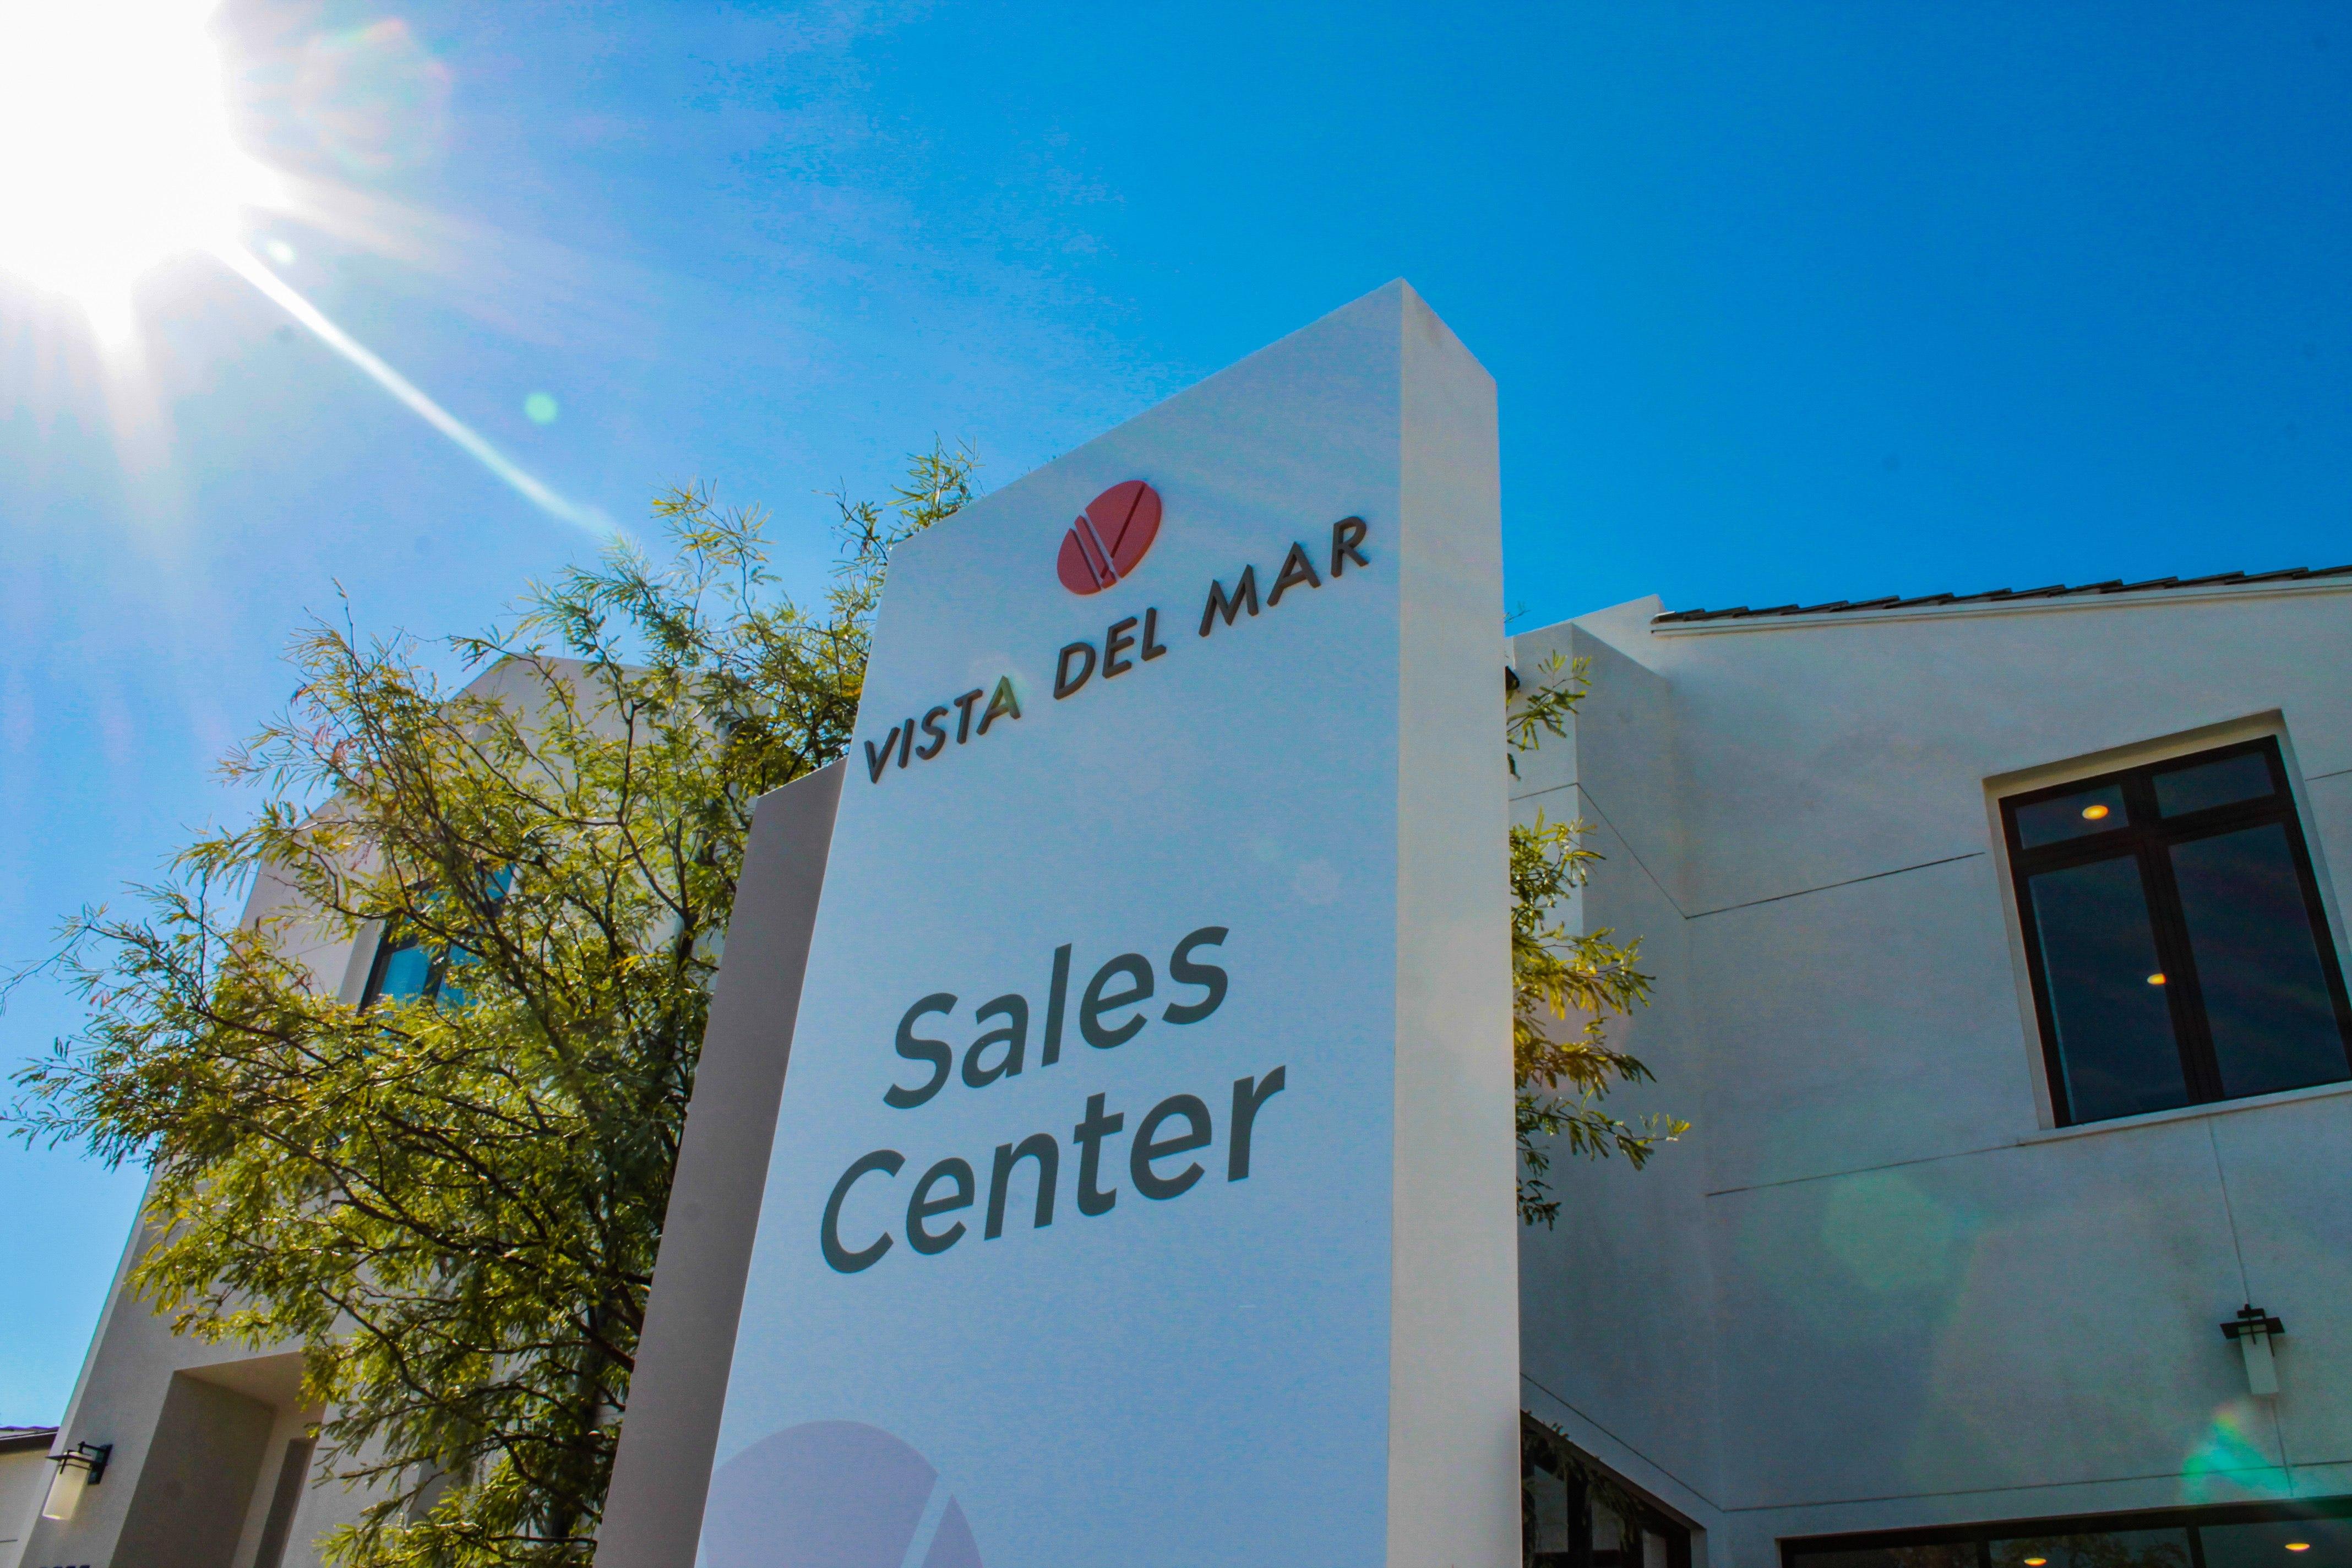 300-vistadelmar-salescentersign2